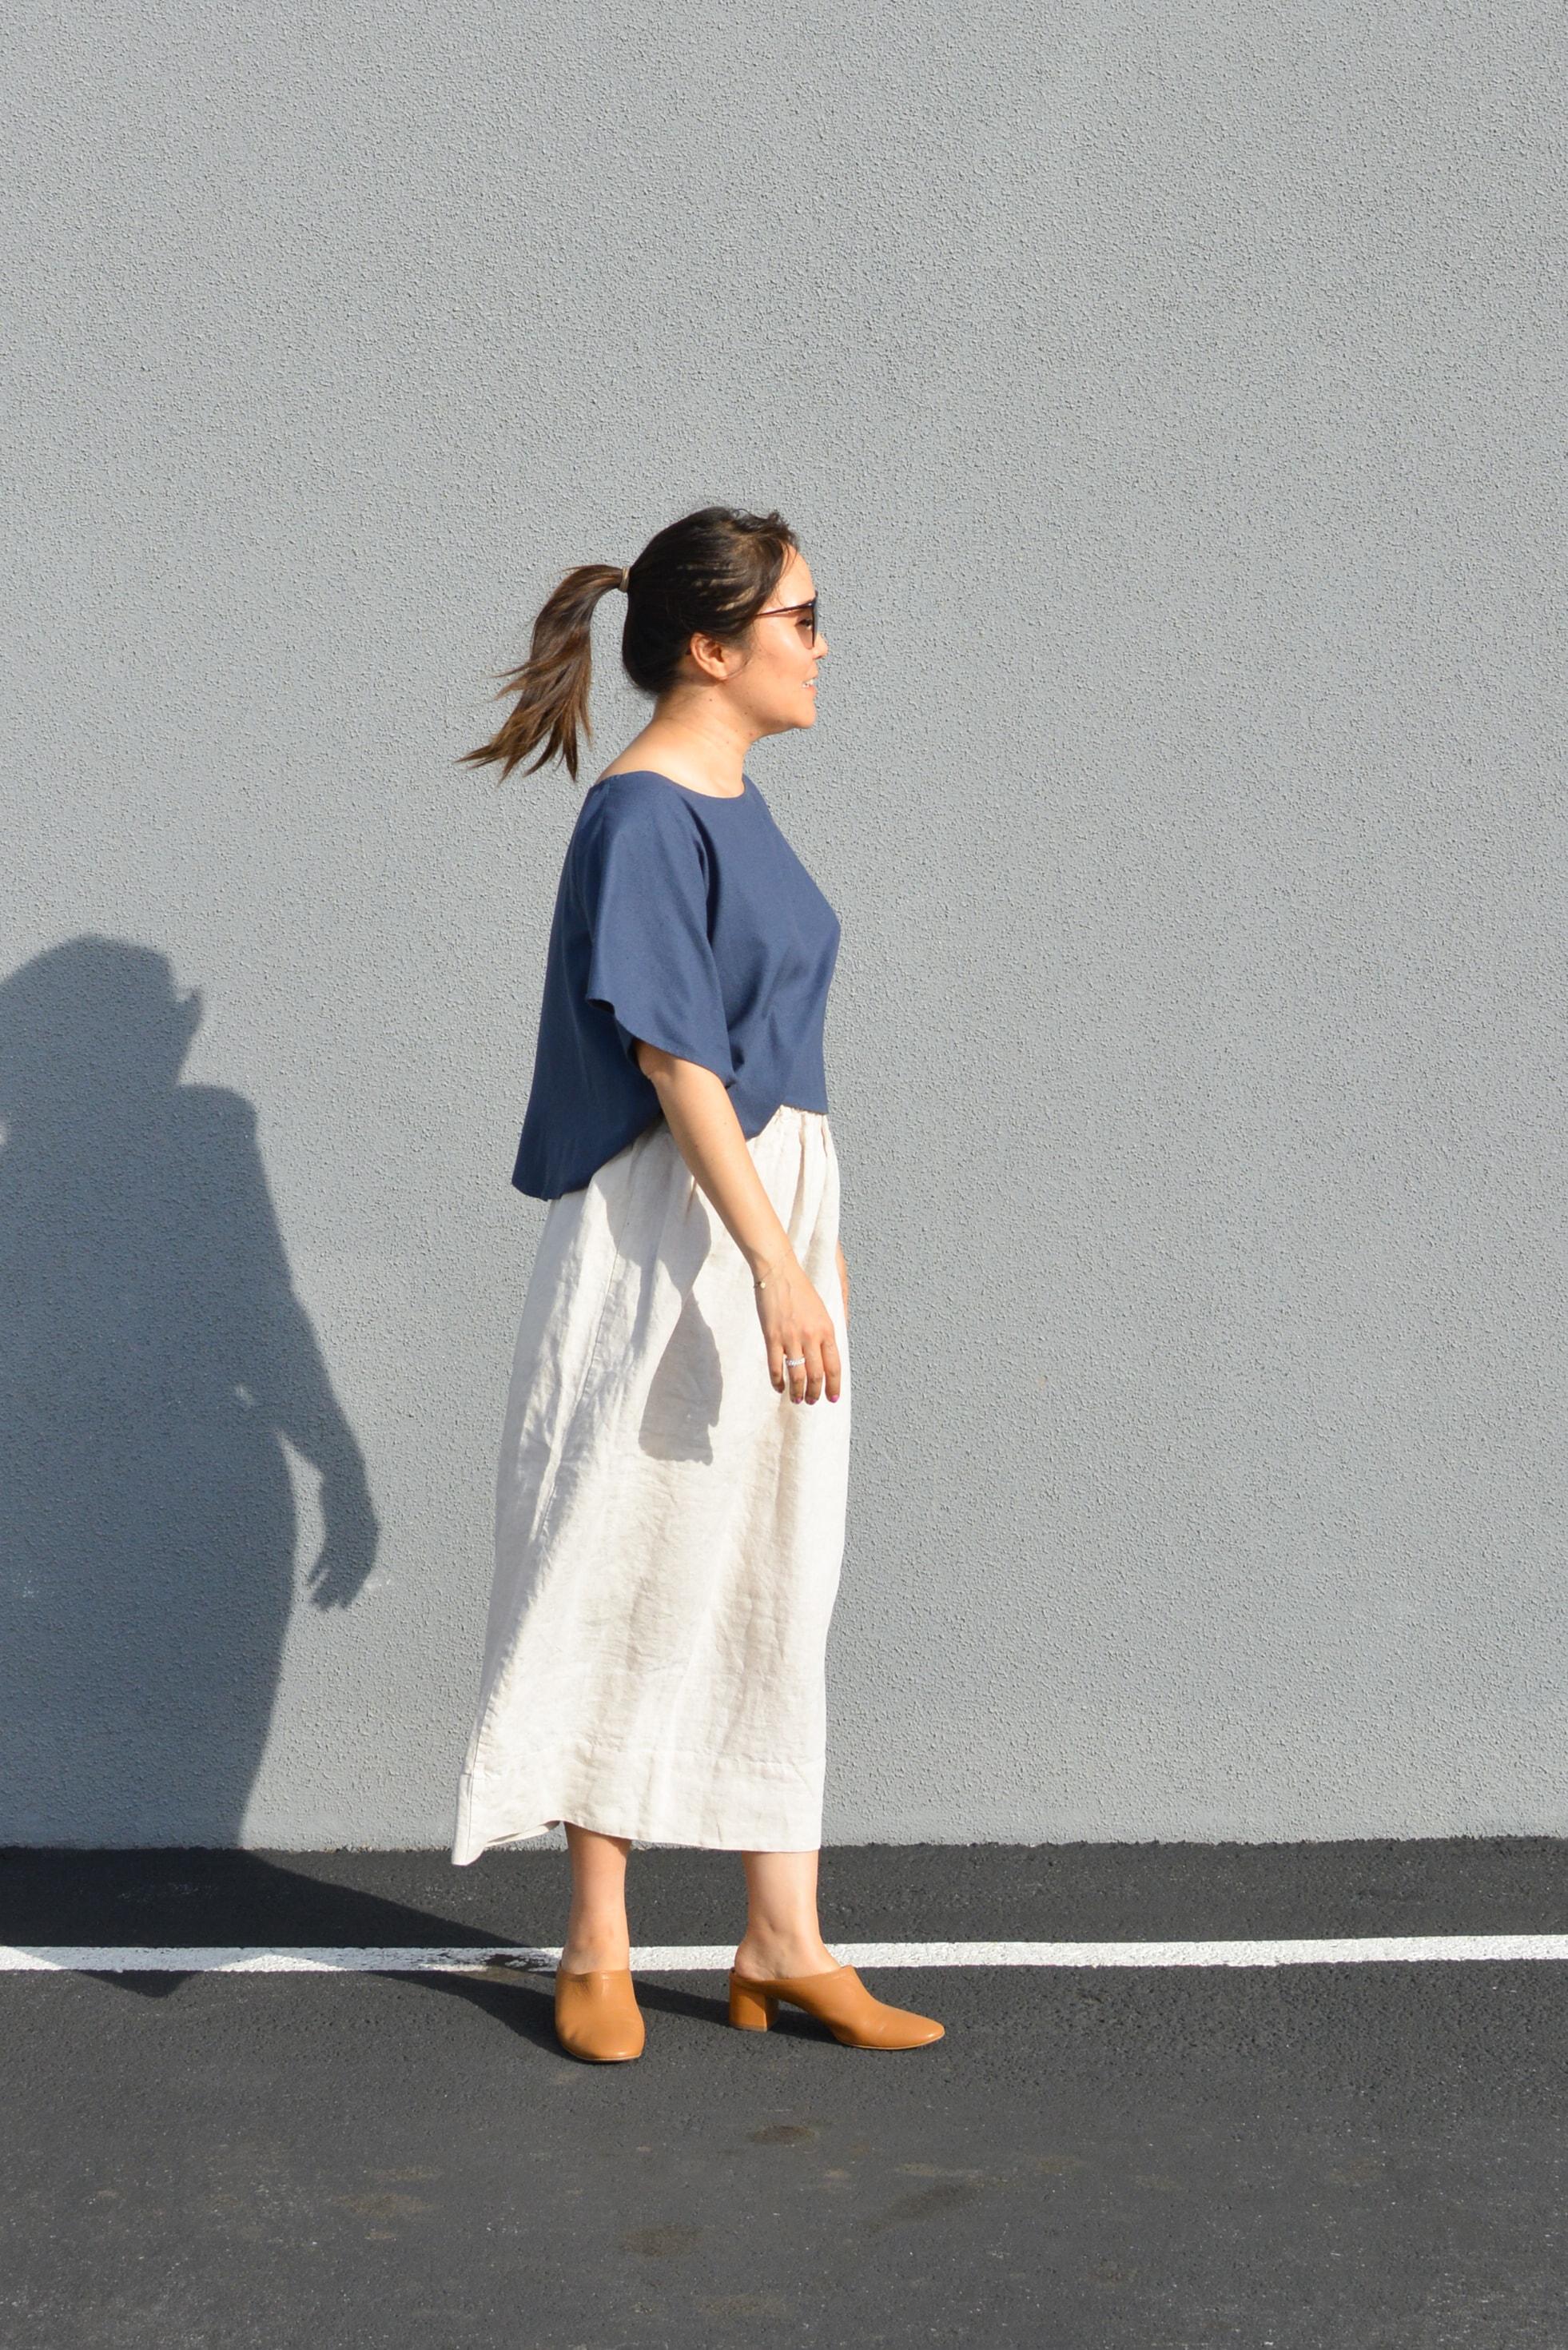 Elizabeth Suzann Review Linen Bel Skirt (3 of 6)-min.jpg